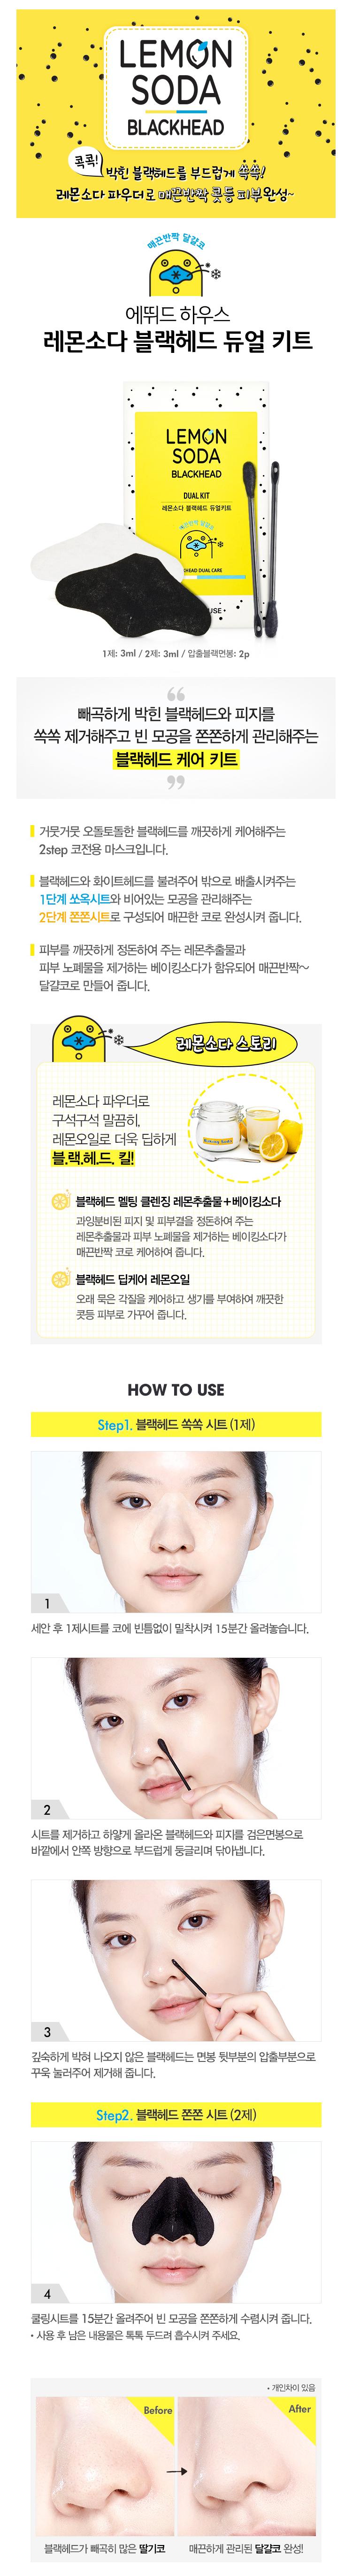 etude-house-lemon-soda-blackhead-dual-kit-1.jpg